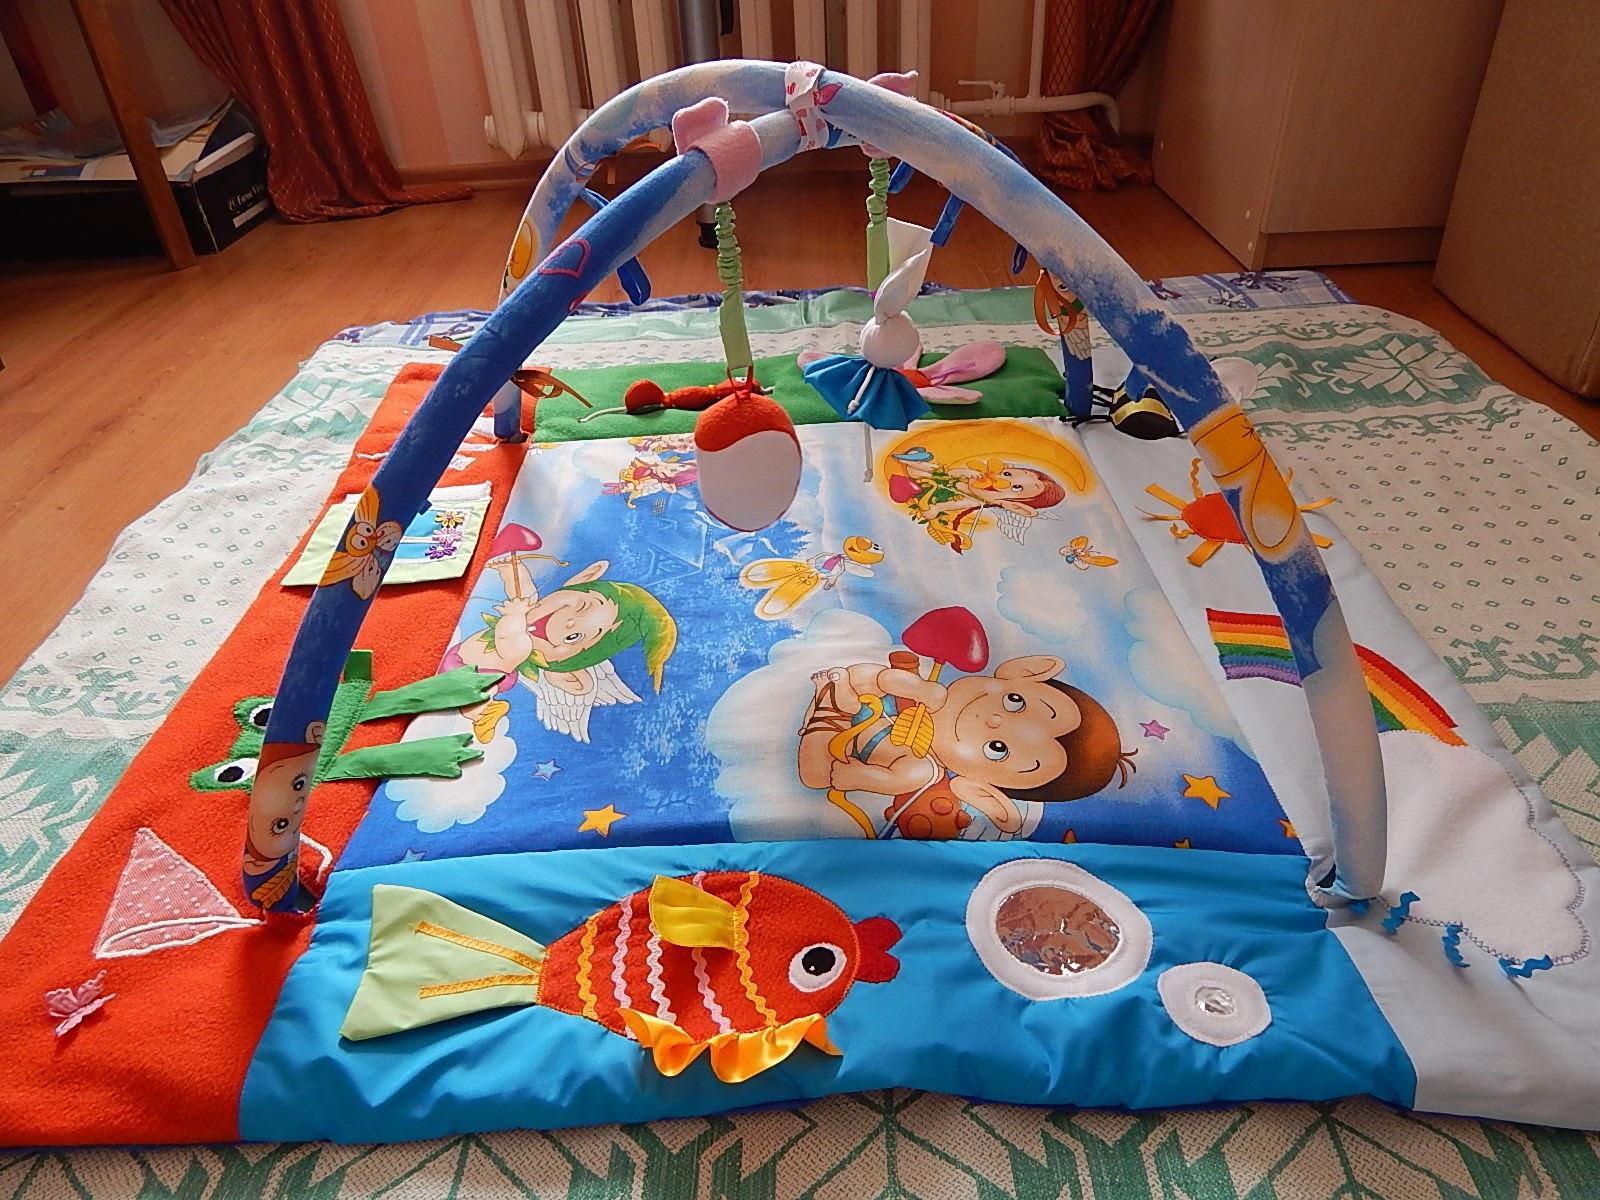 развивающий коврик для детей идеи фото